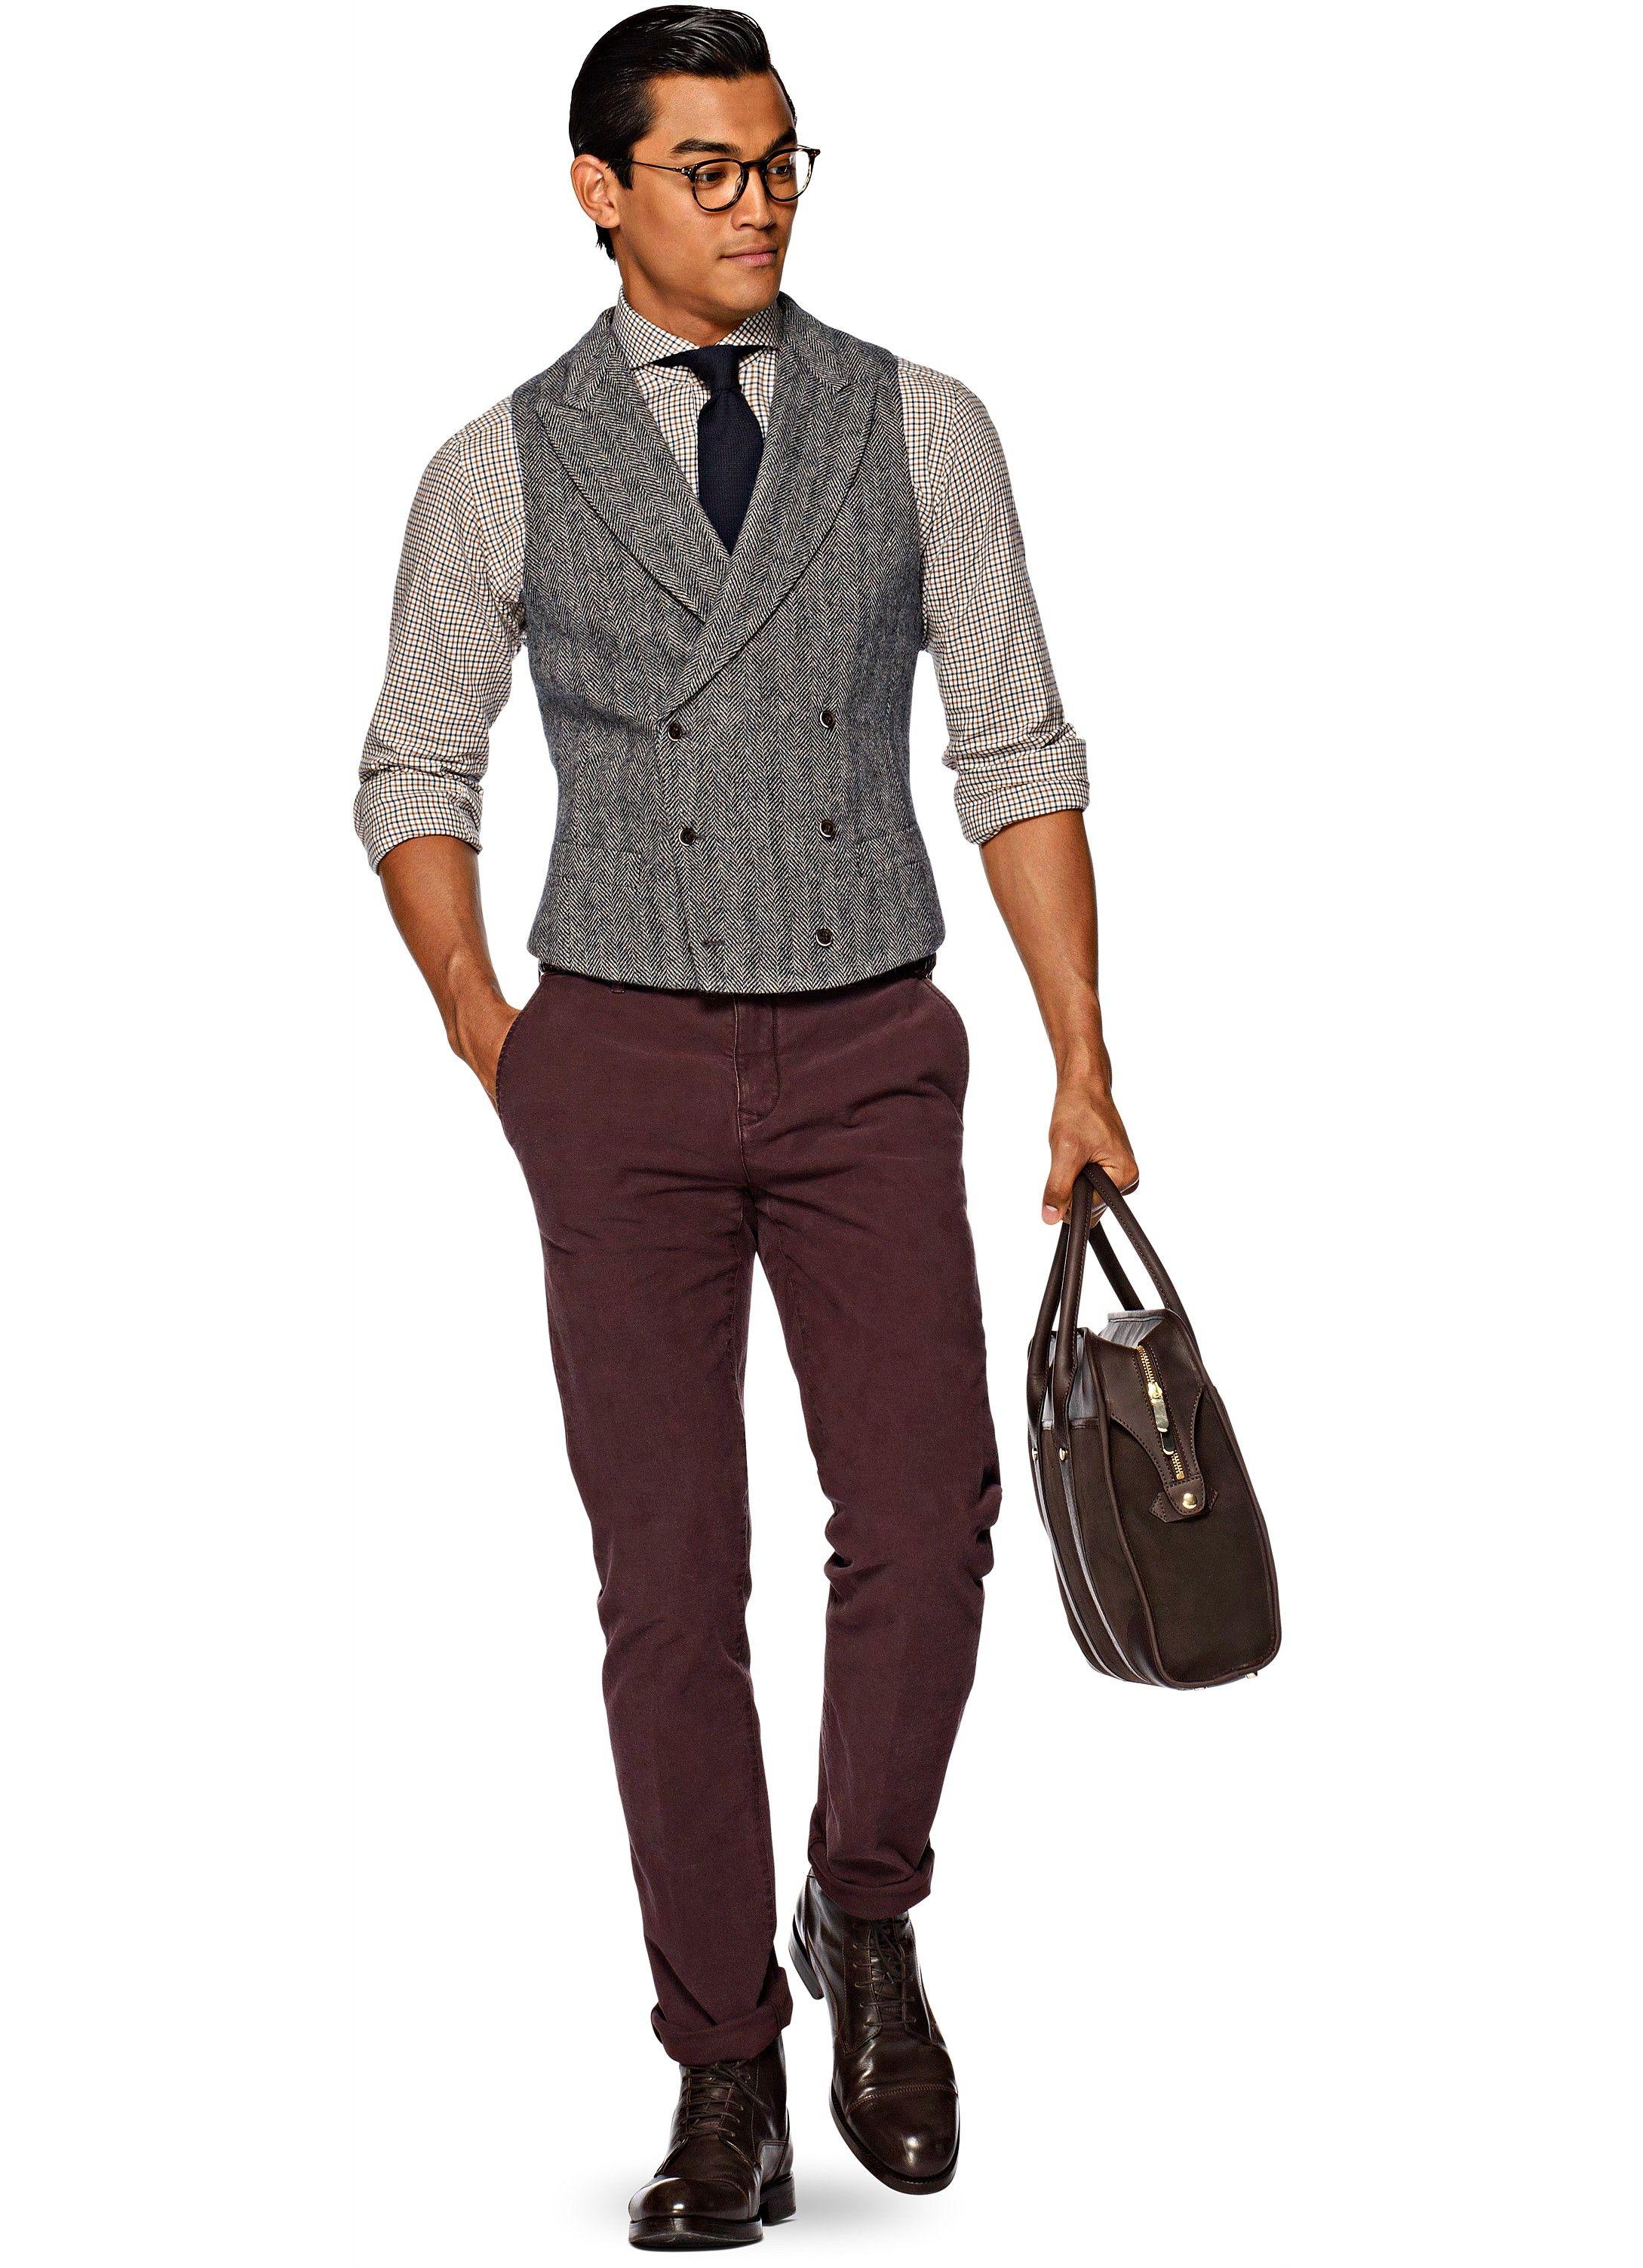 Blue Waistcoat W150211 Mens Outfits Mens Fashion Suits Smart Casual Men